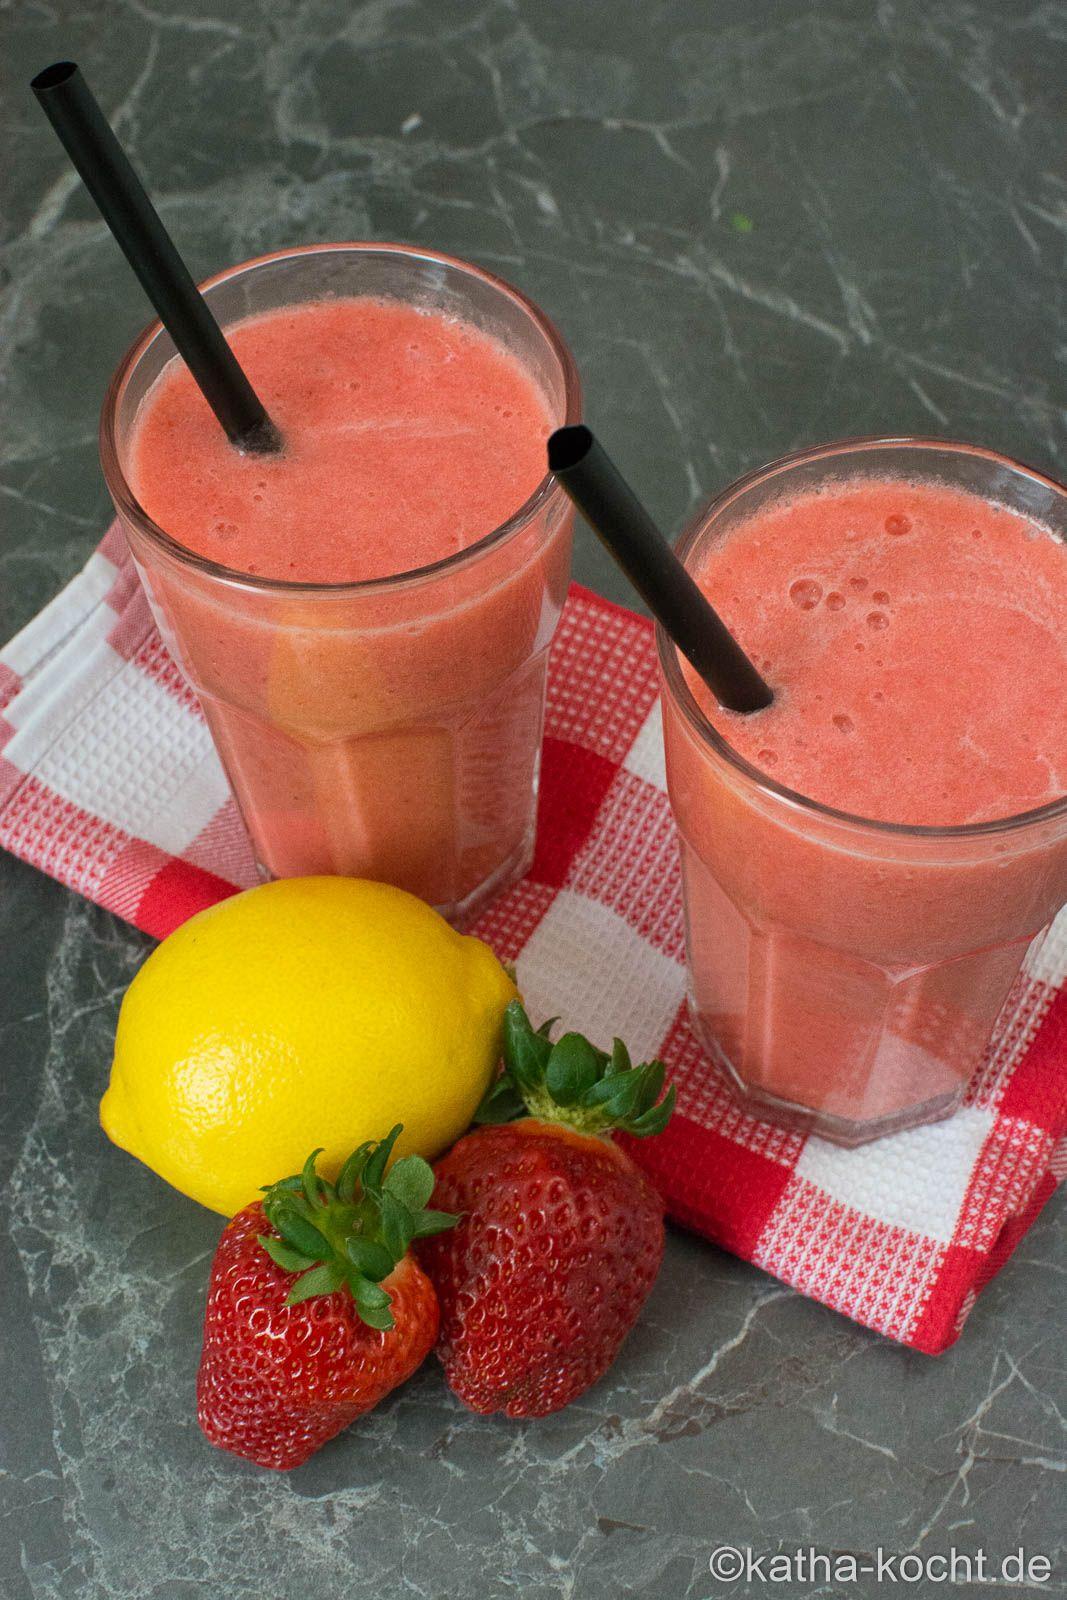 Erdbeer-Banane Smoothie mit extra Vitamin C - Katha-kocht!